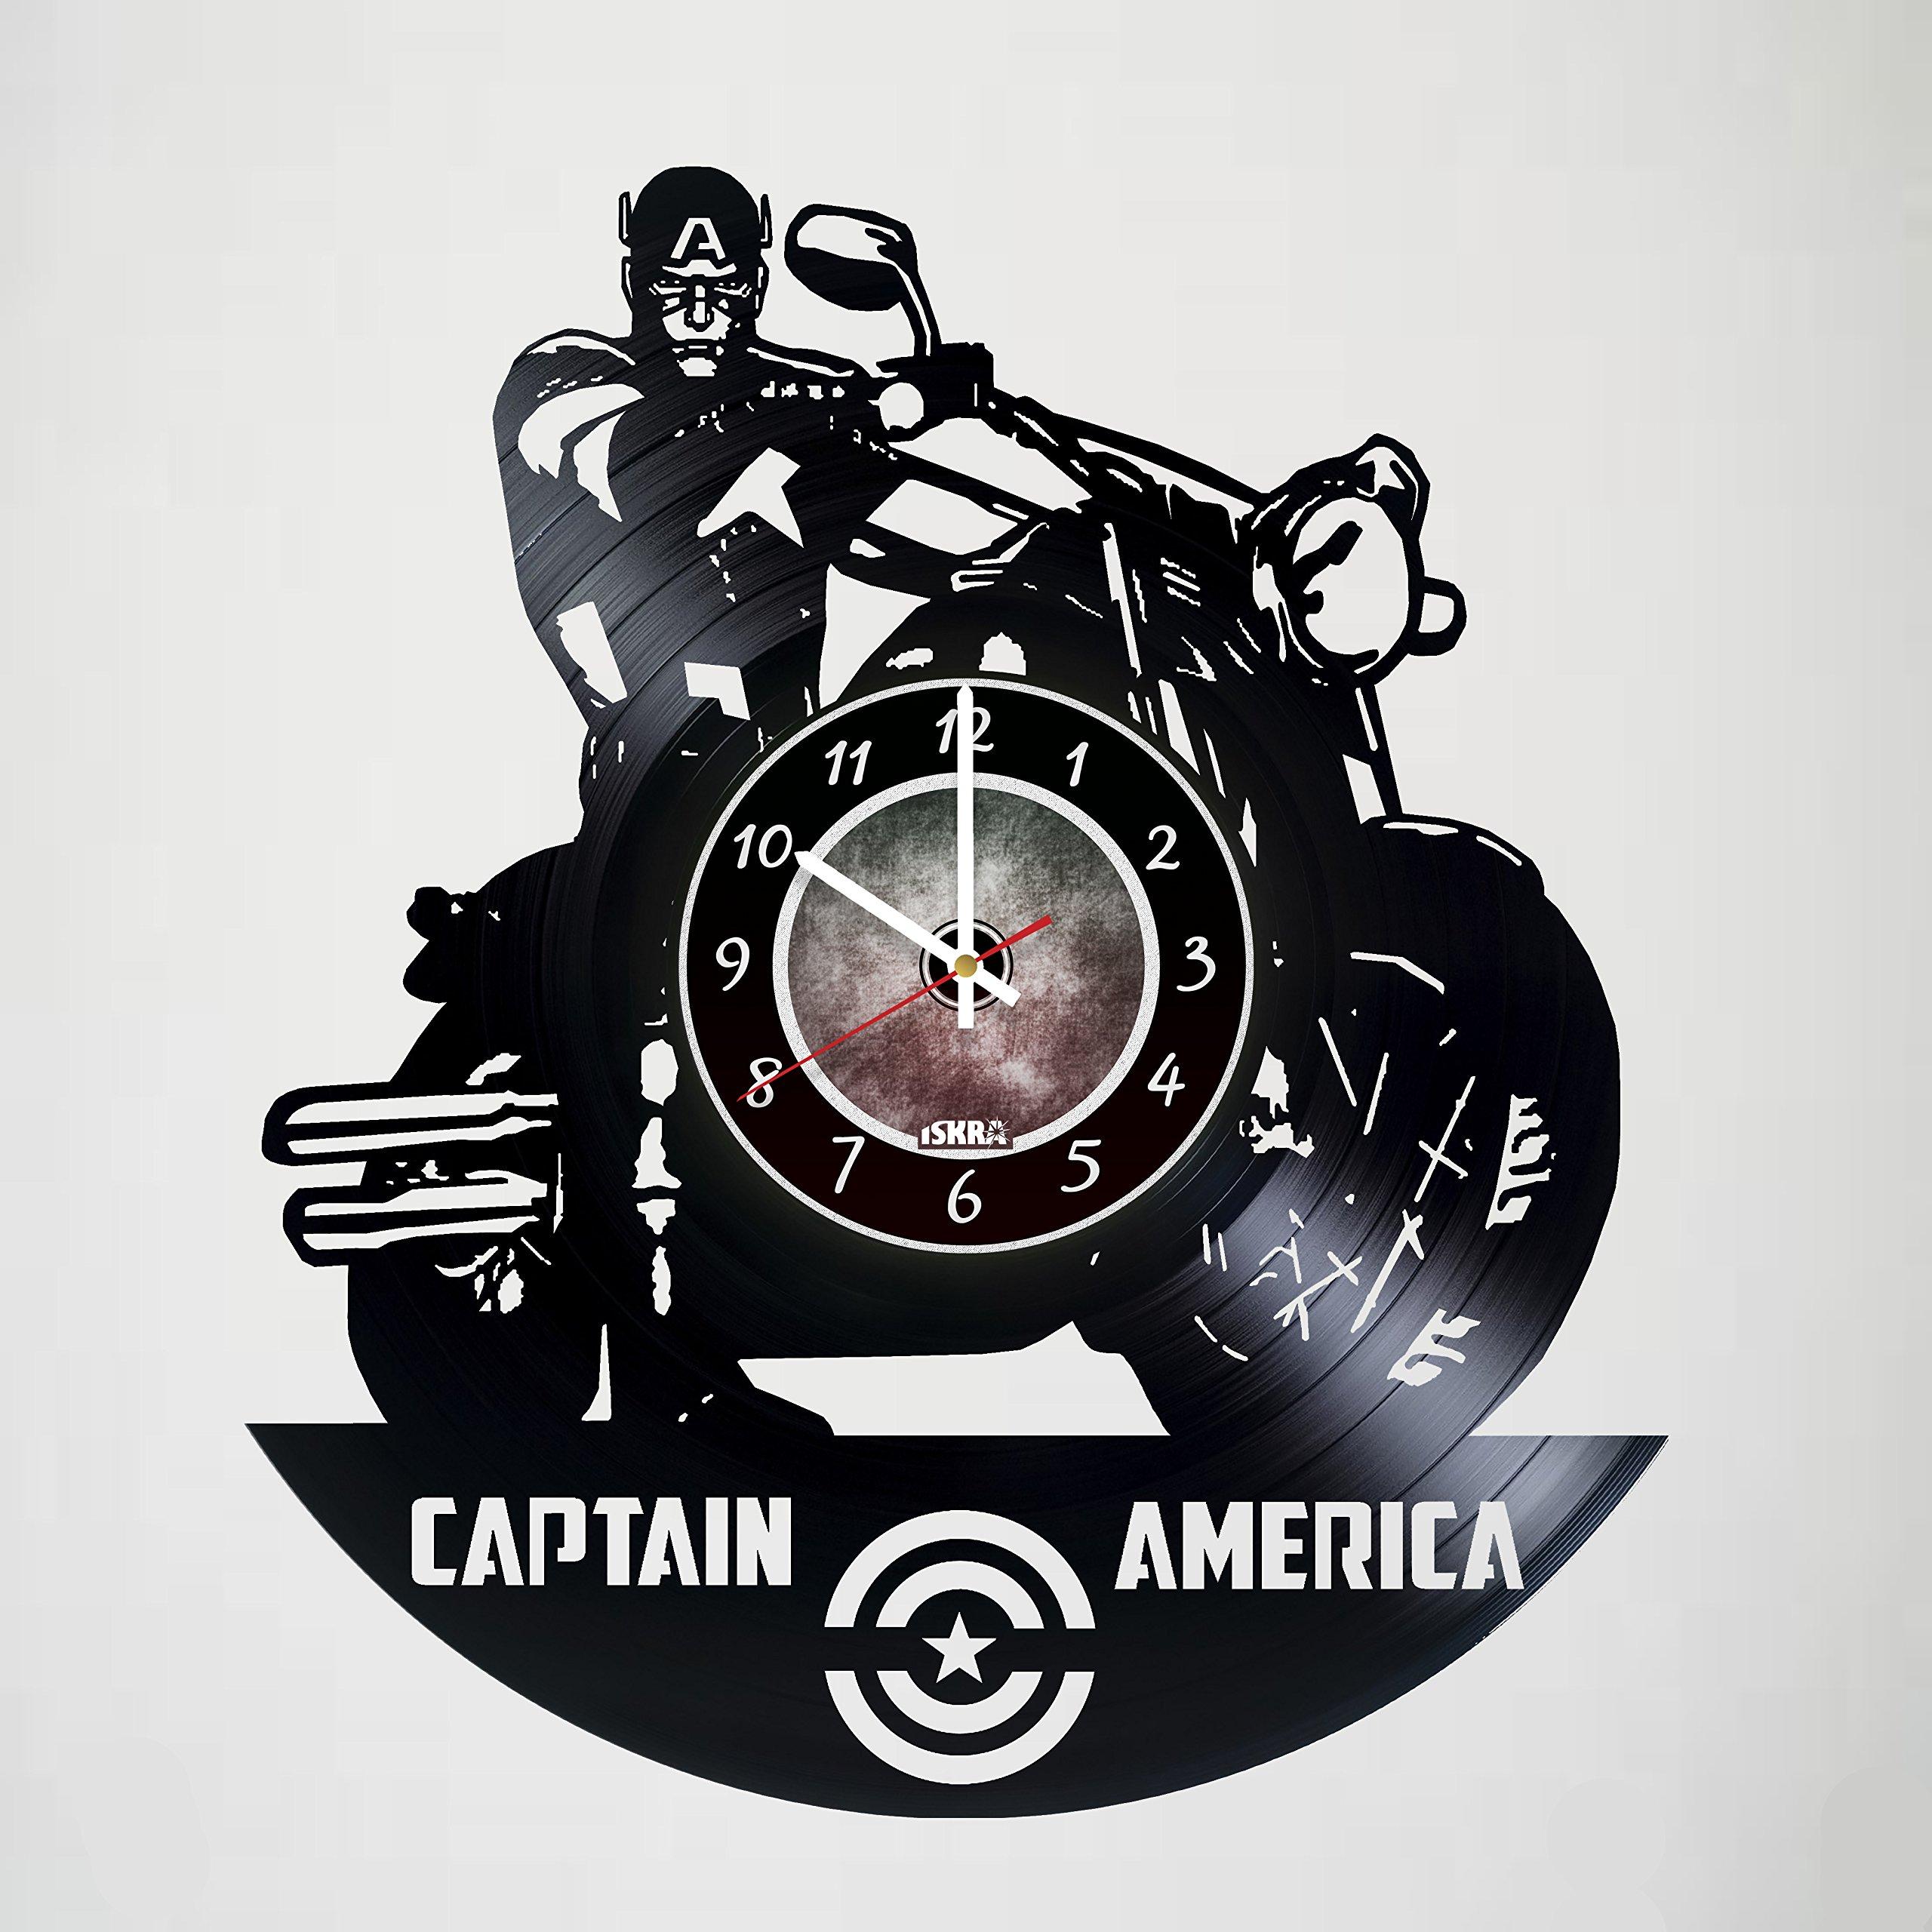 Iskra Shop CAPTAIN AMERICA - AVENGERS - Vinyl Wall Clock - Comics - Get unique living room wall decor - Gift ideas for friends, teens, children, men and women, boys and girls - Comics Books Films